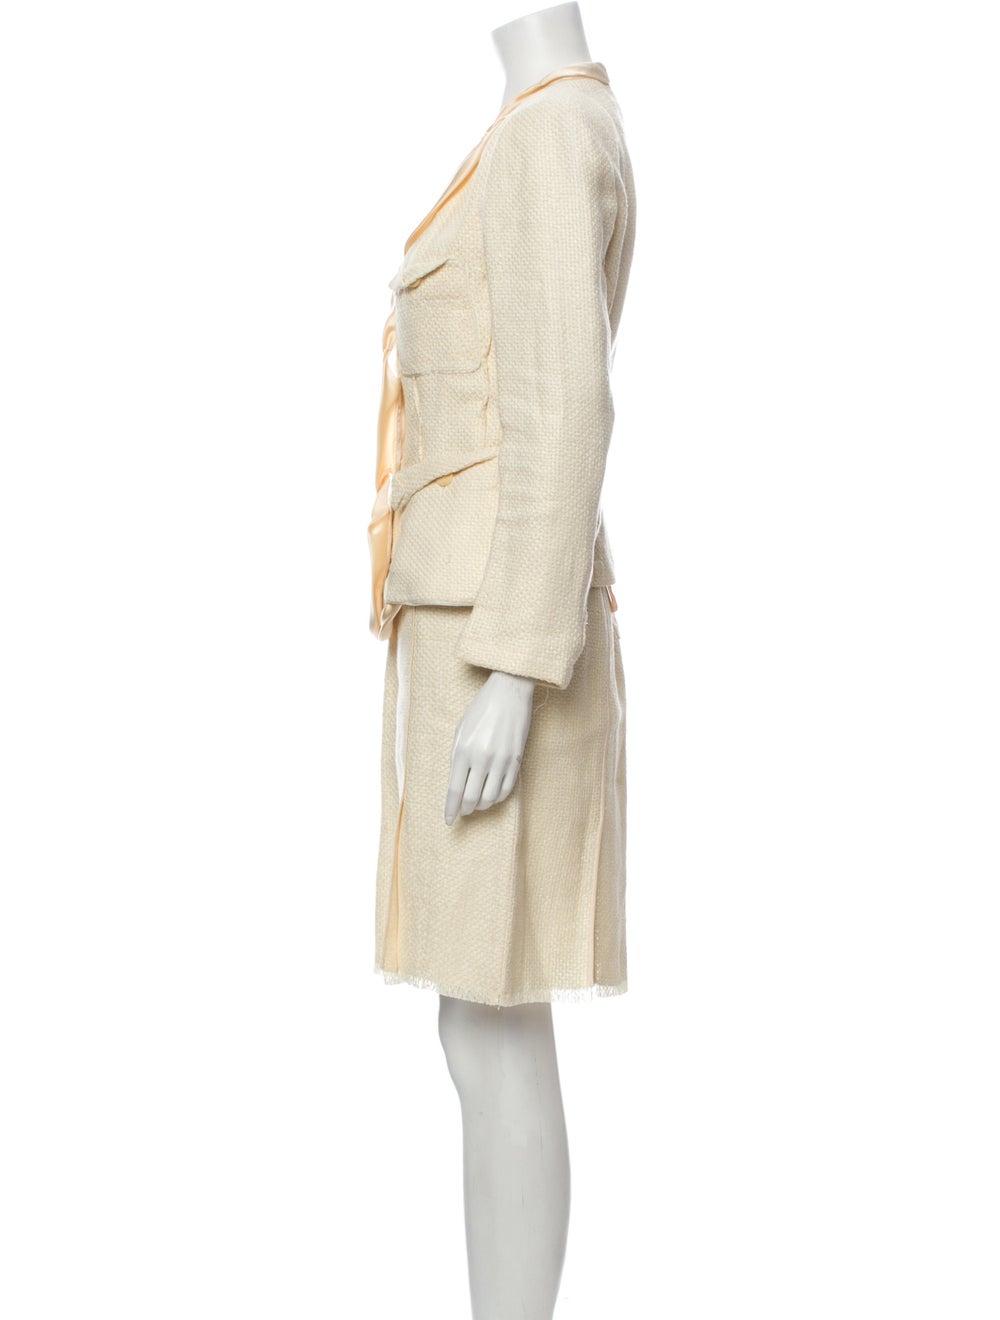 Donna Karan Linen Skirt Suit - image 2